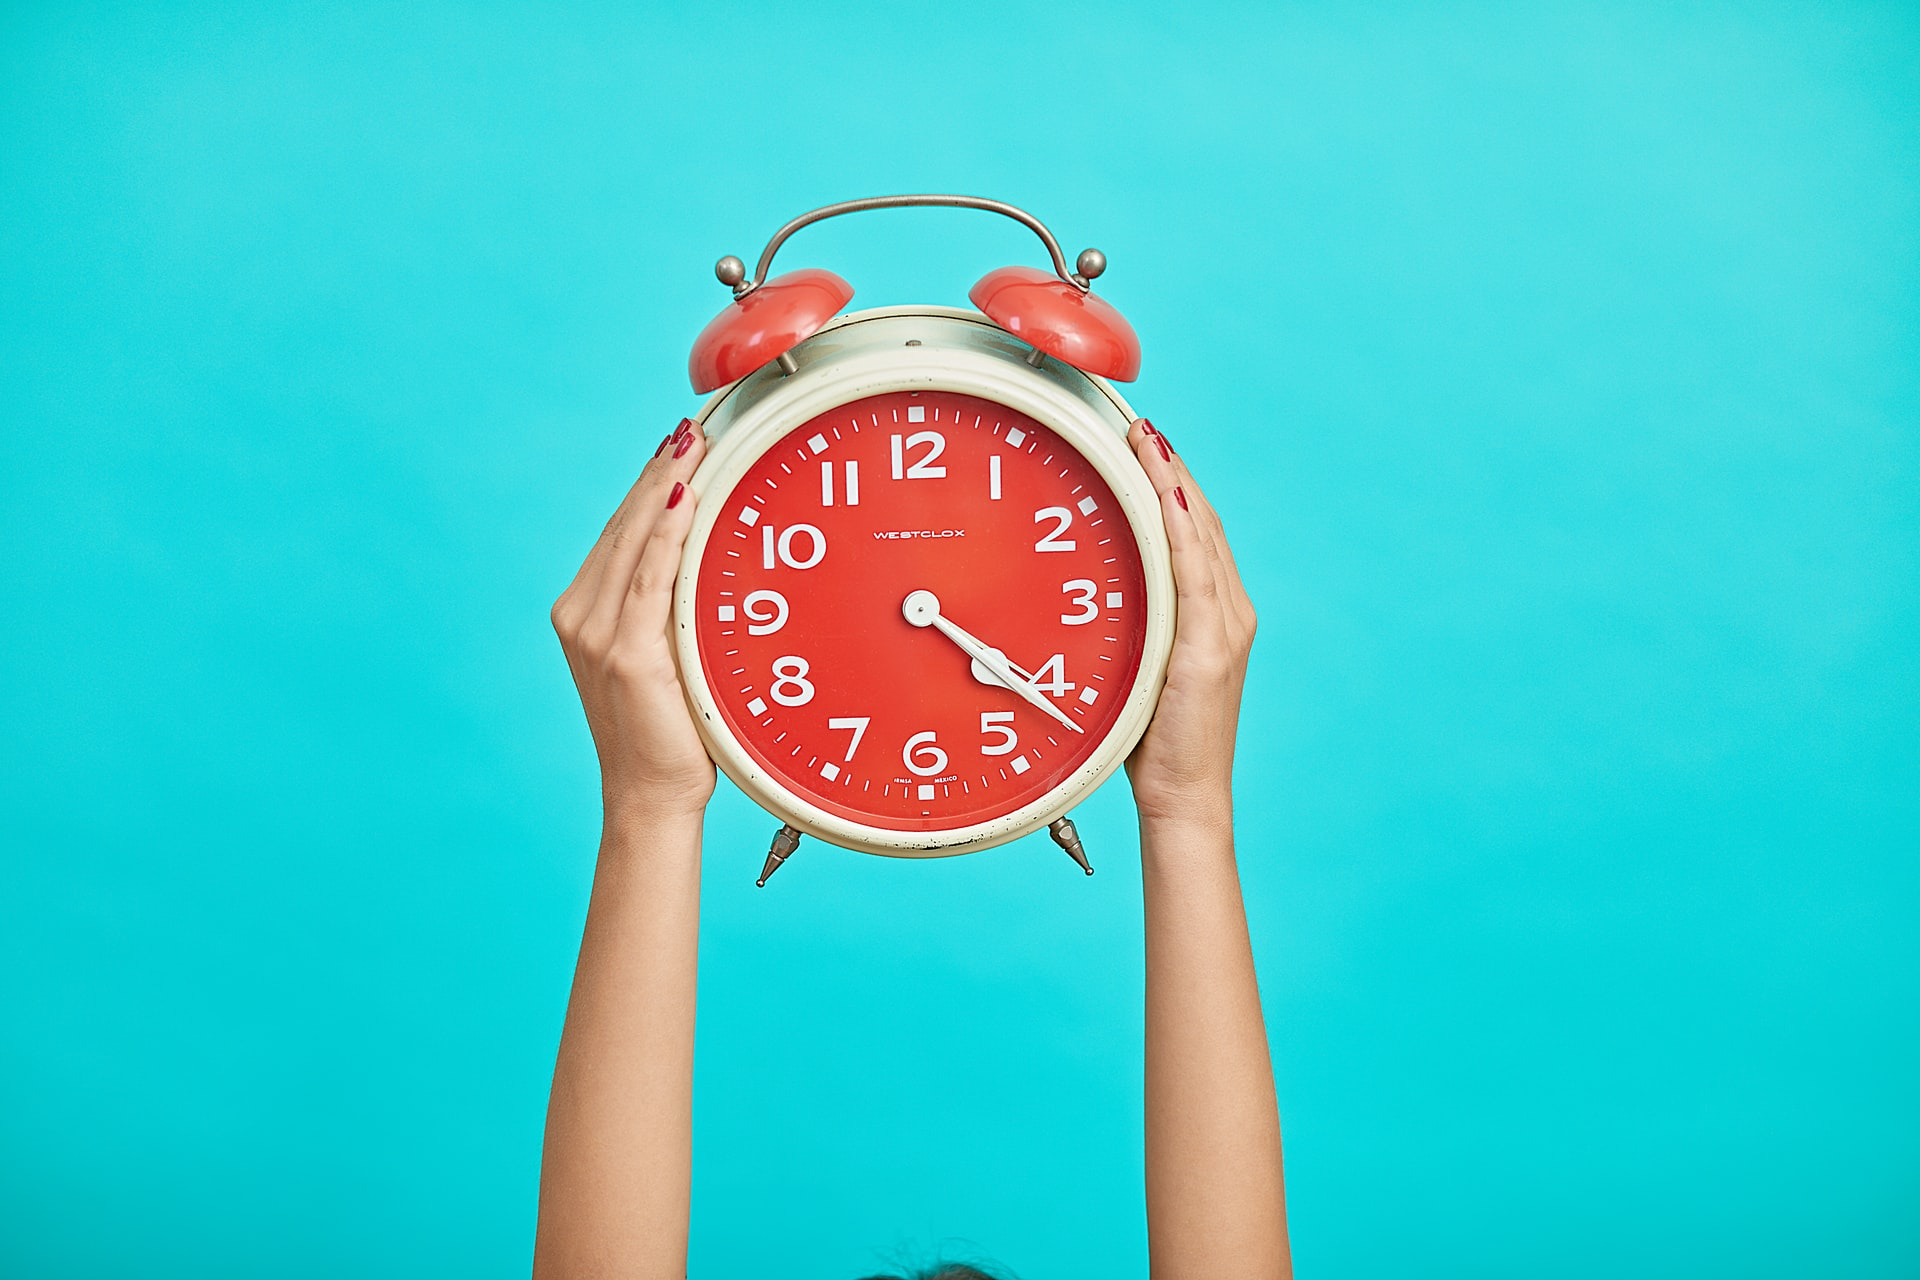 Insurance handling time image